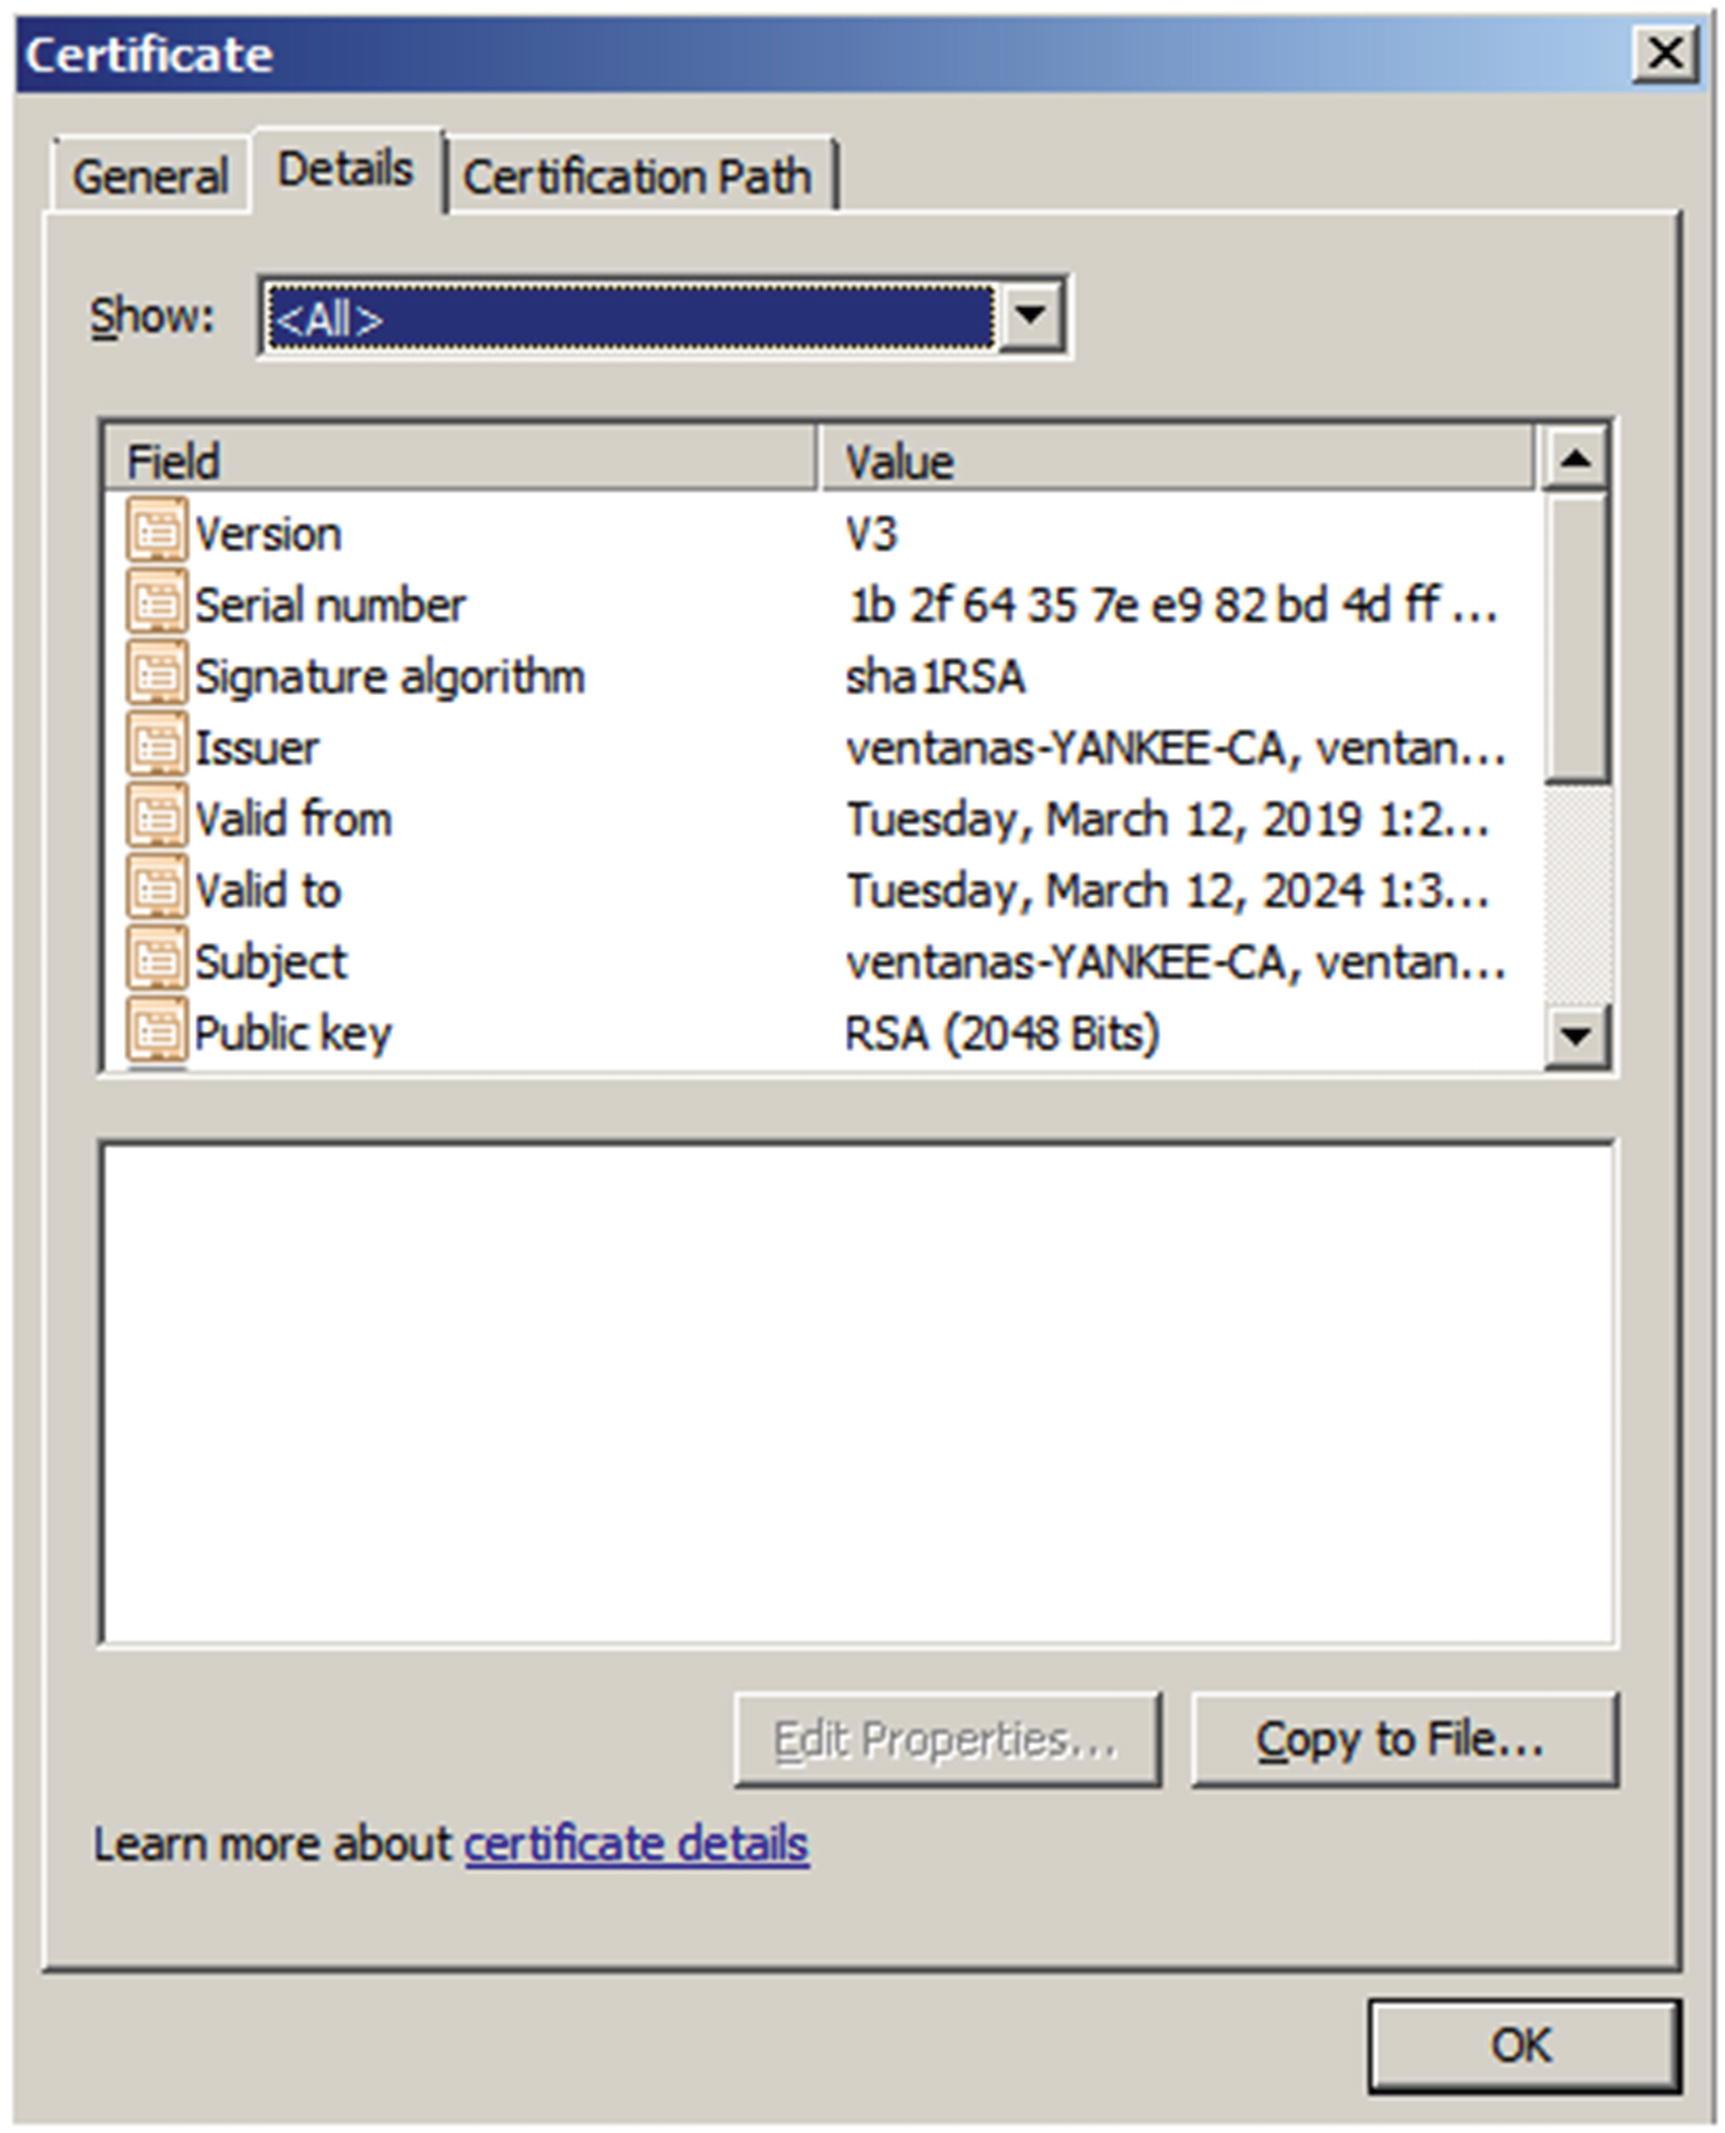 FreeIPA AD Integration | SpringerLink